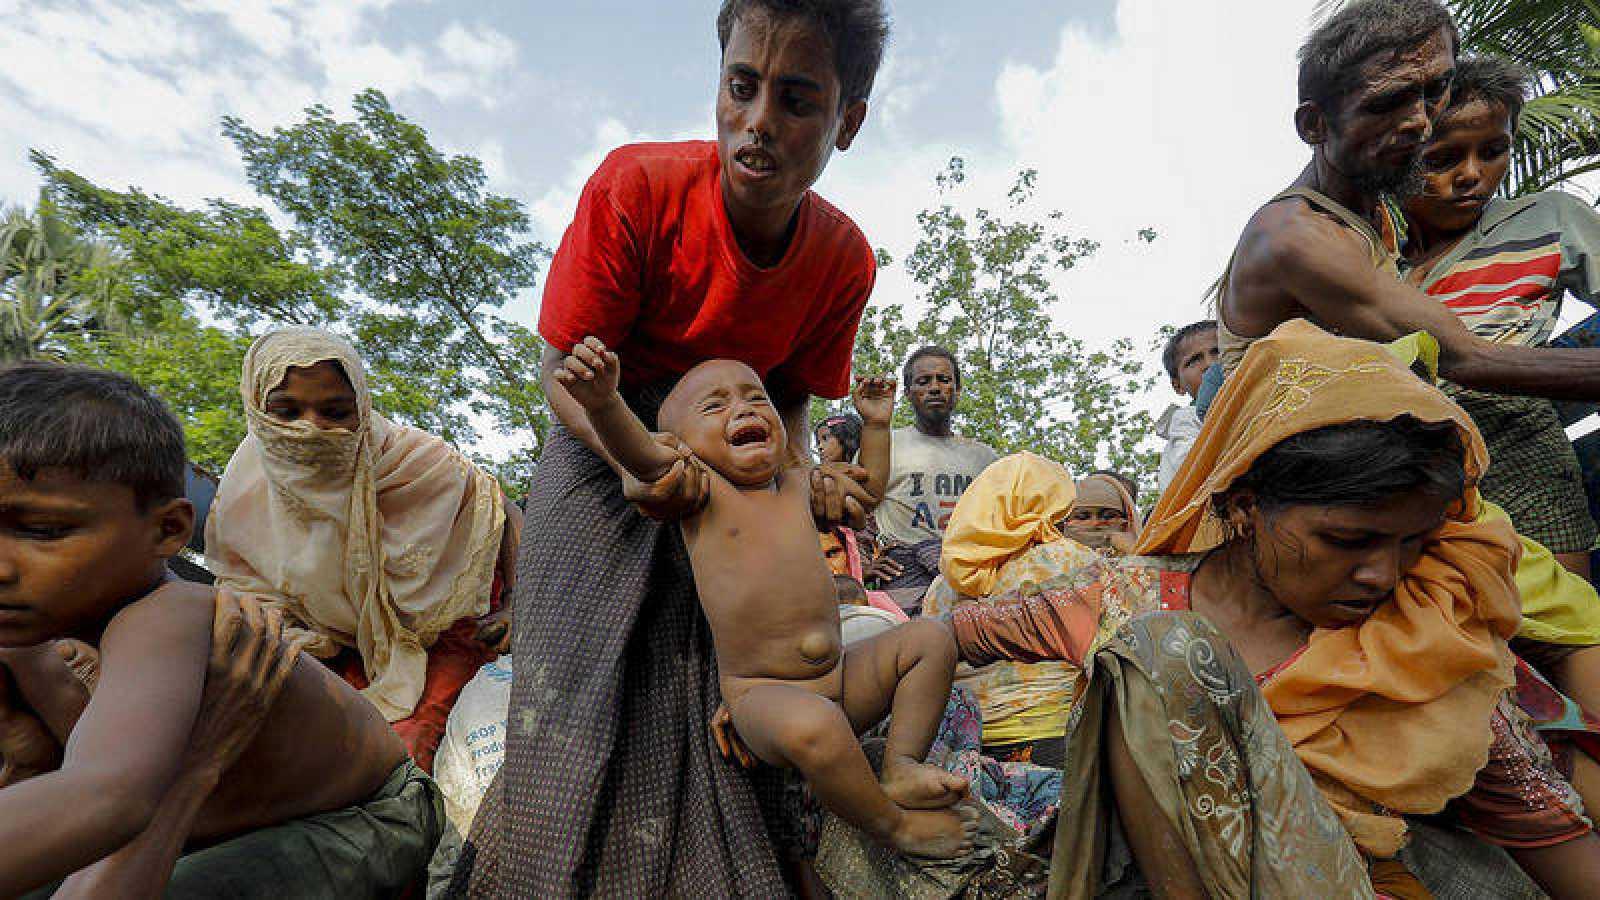 Refugiados rohinyás de Birmania llegan a un campo de acogida en Bangladés